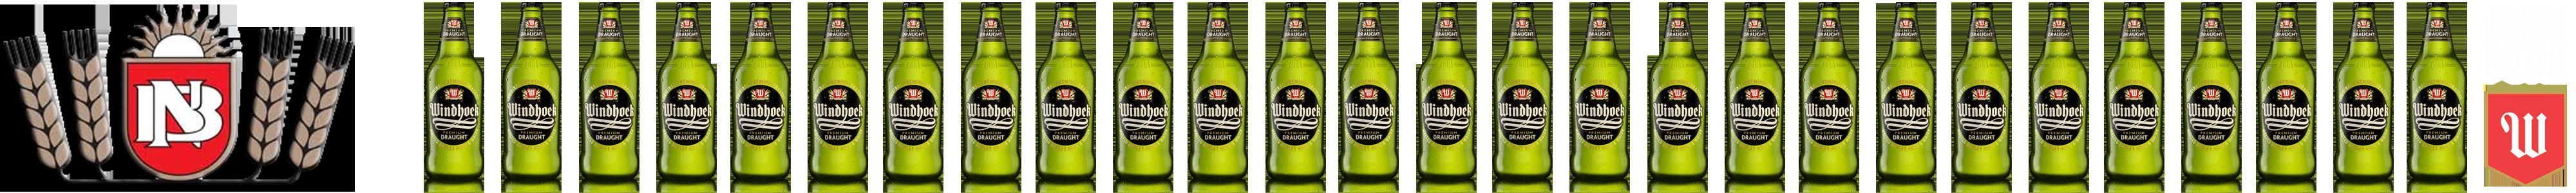 NBL Promo: Windhoek Draught